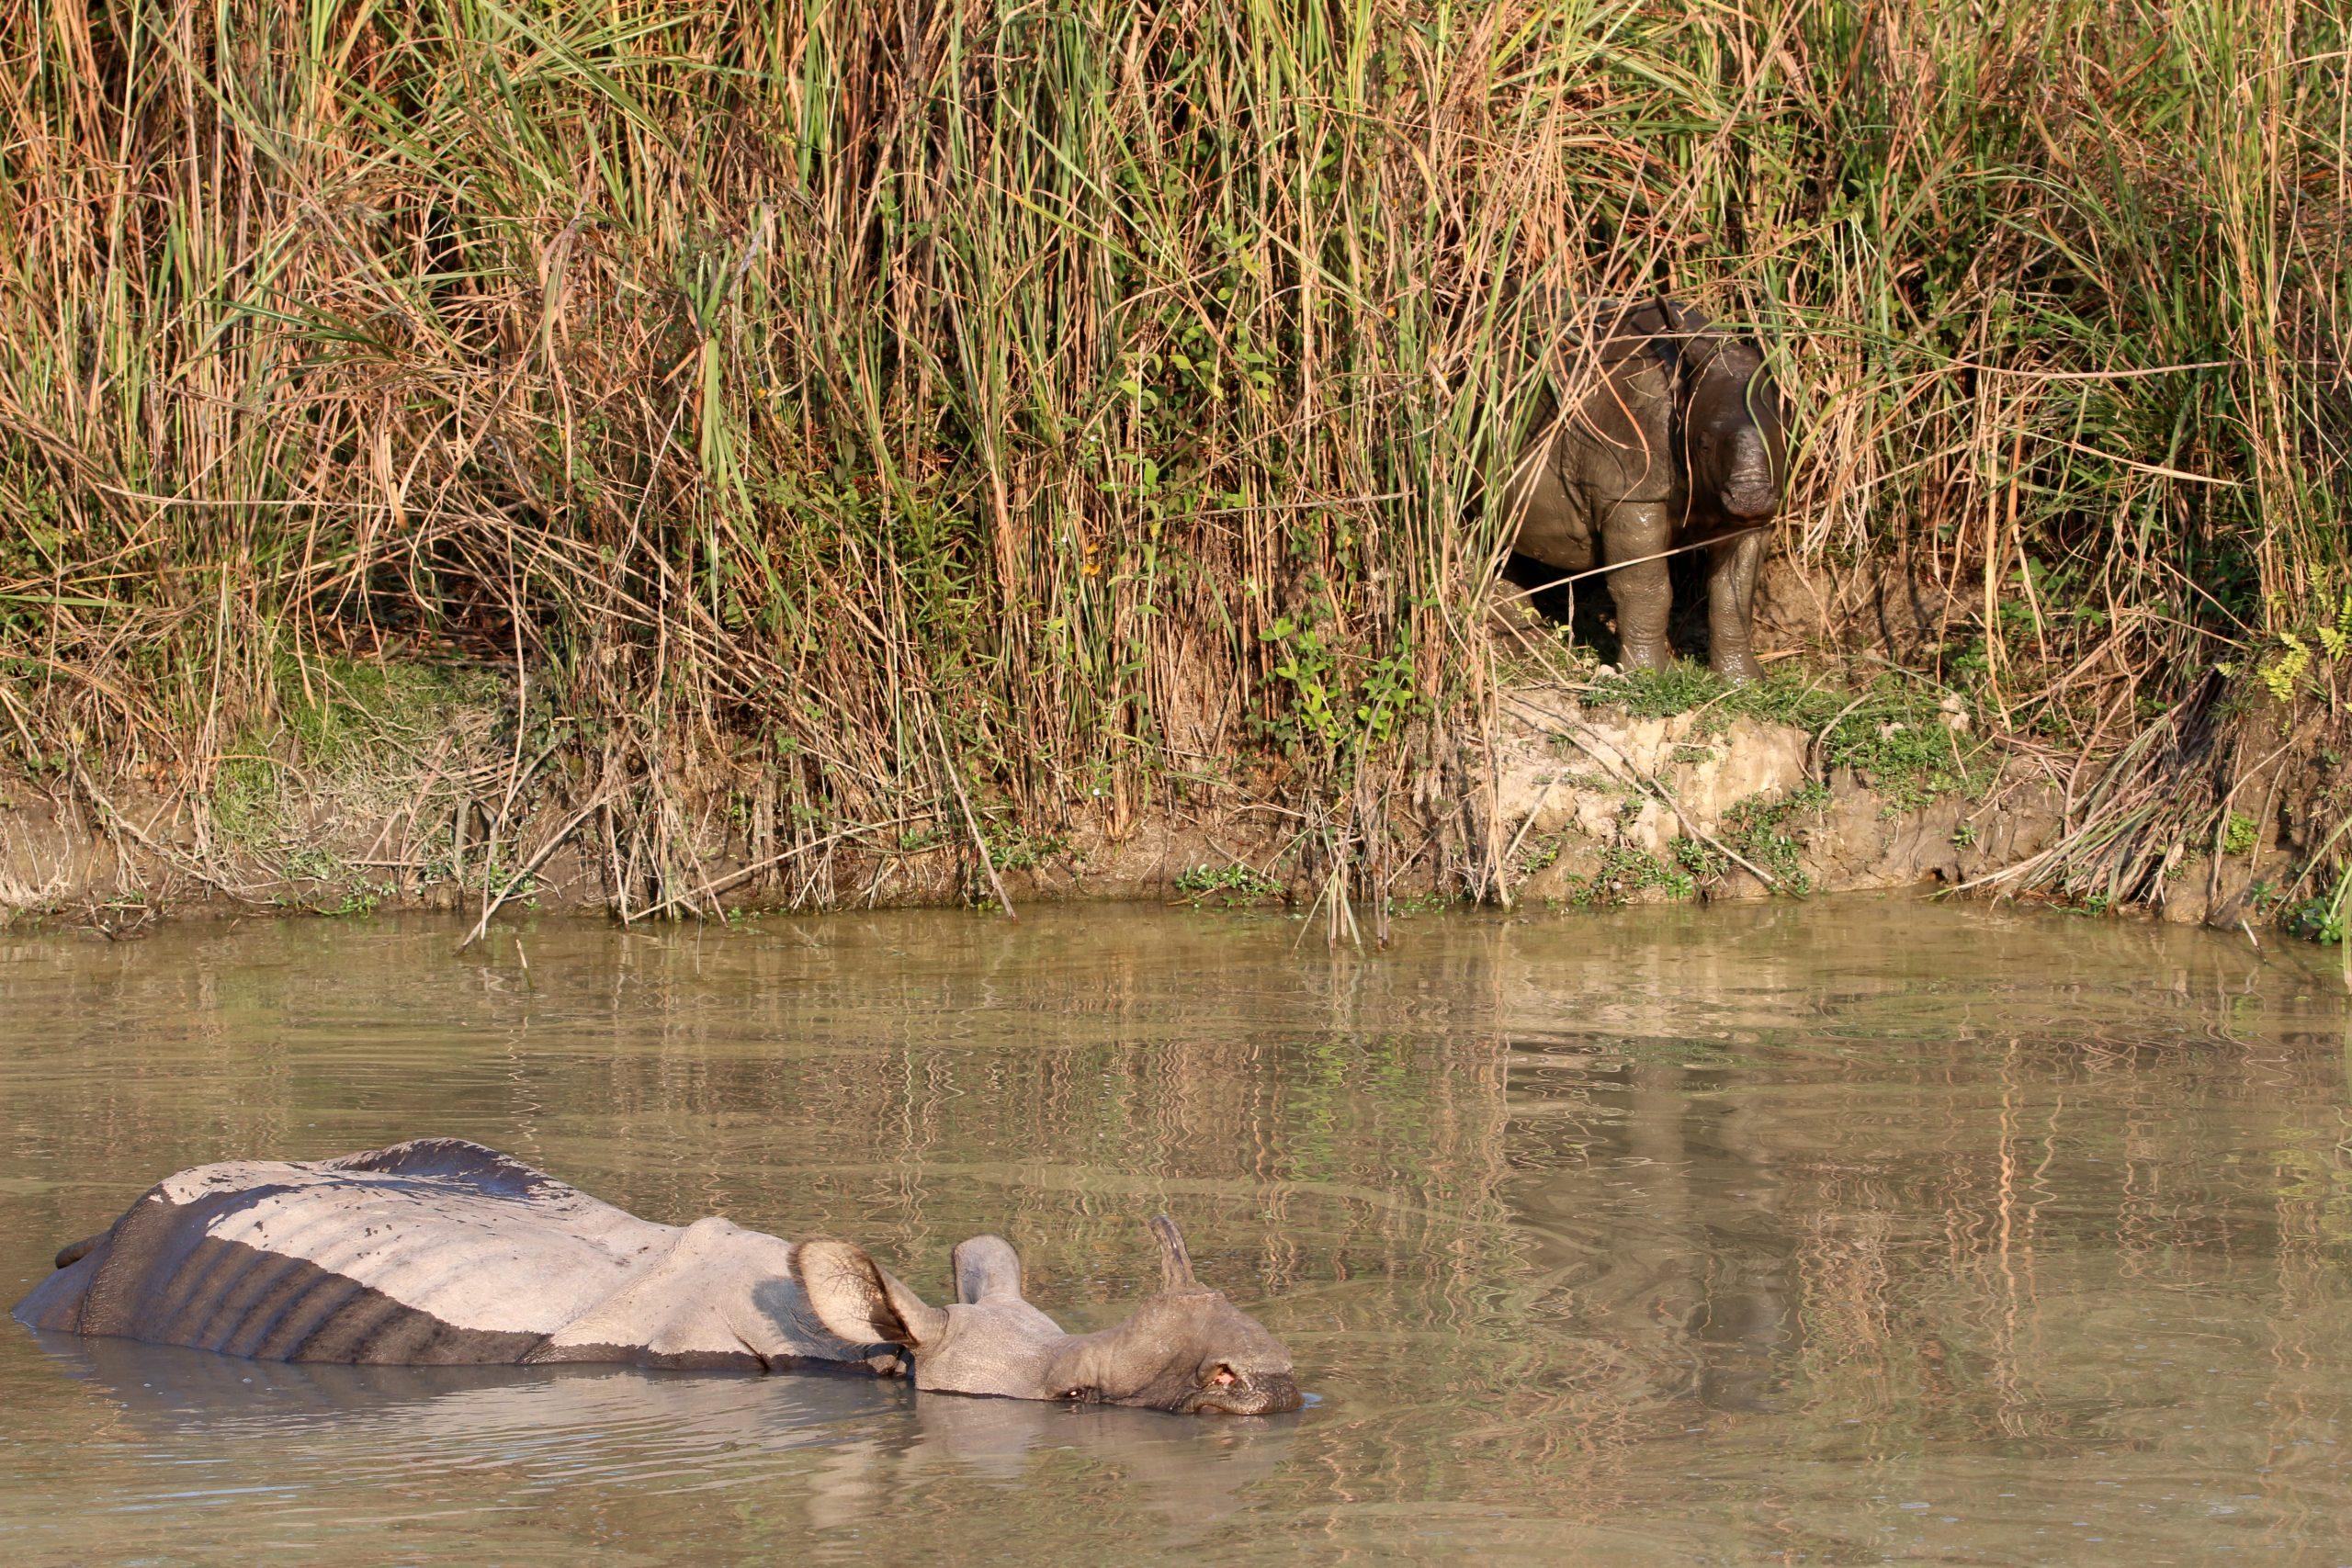 Rhino in the river